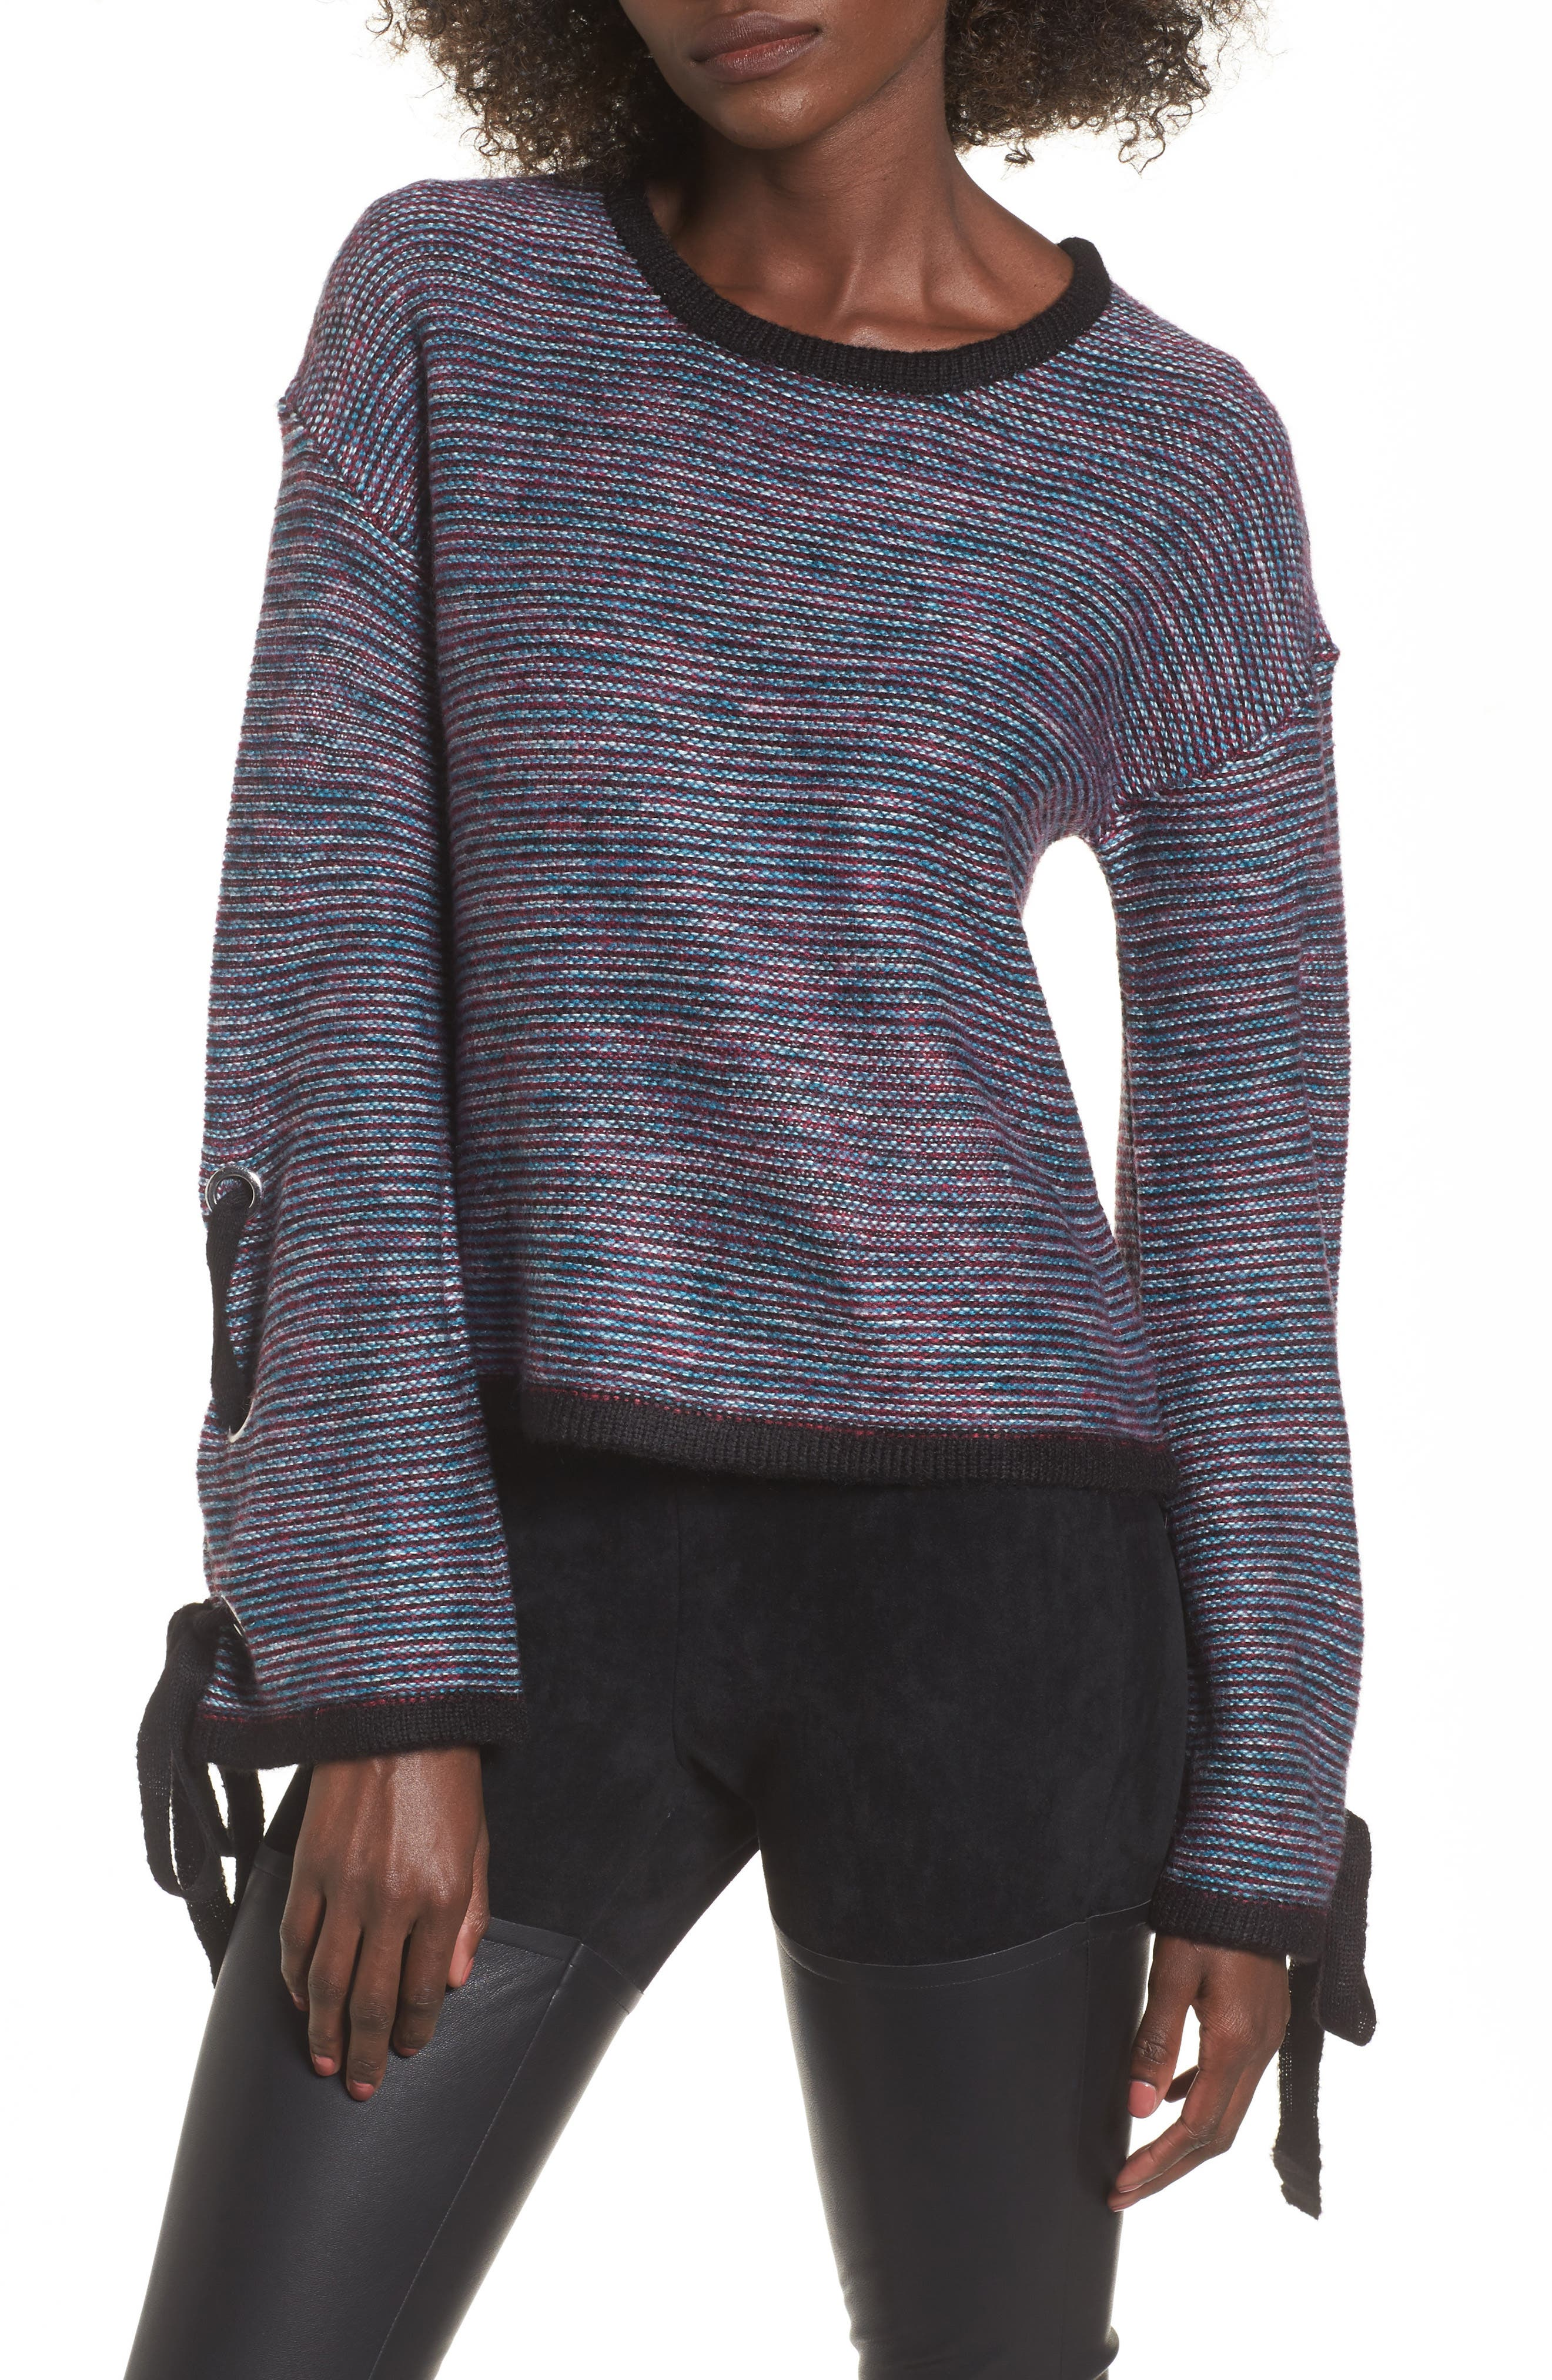 devlin Mandy Grommet Sleeve Sweater